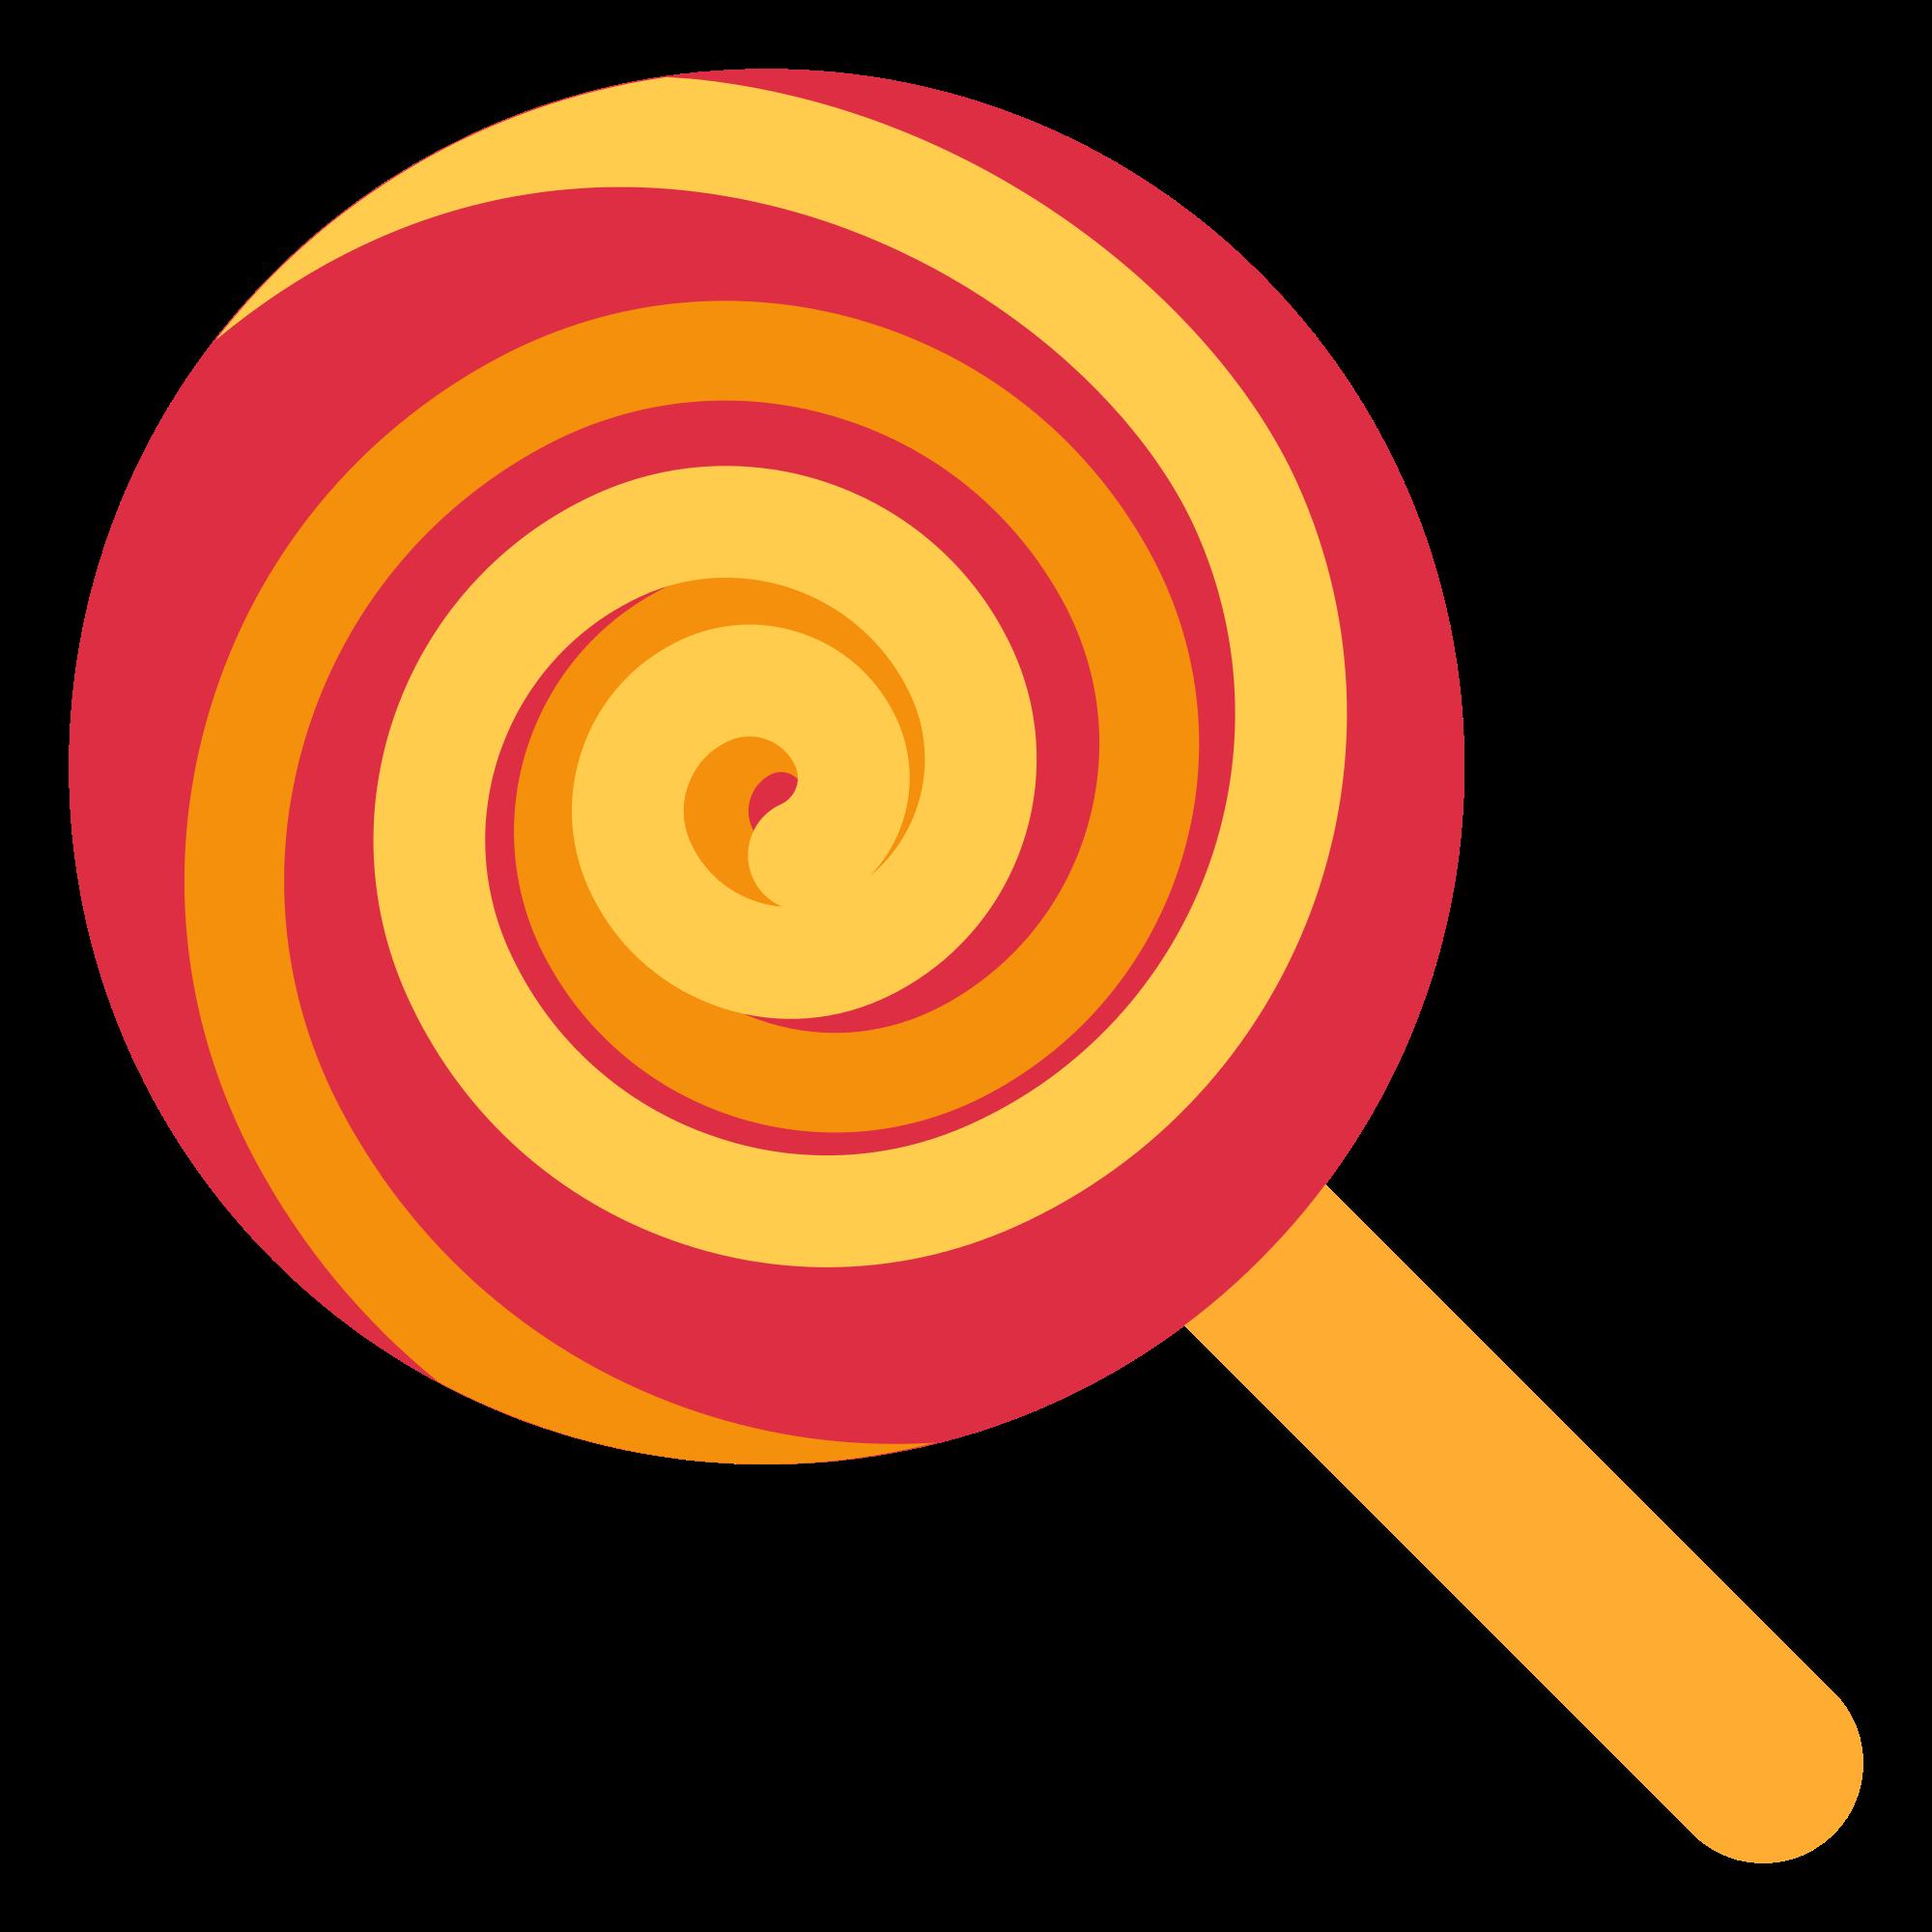 Lollipop svg #17, Download drawings